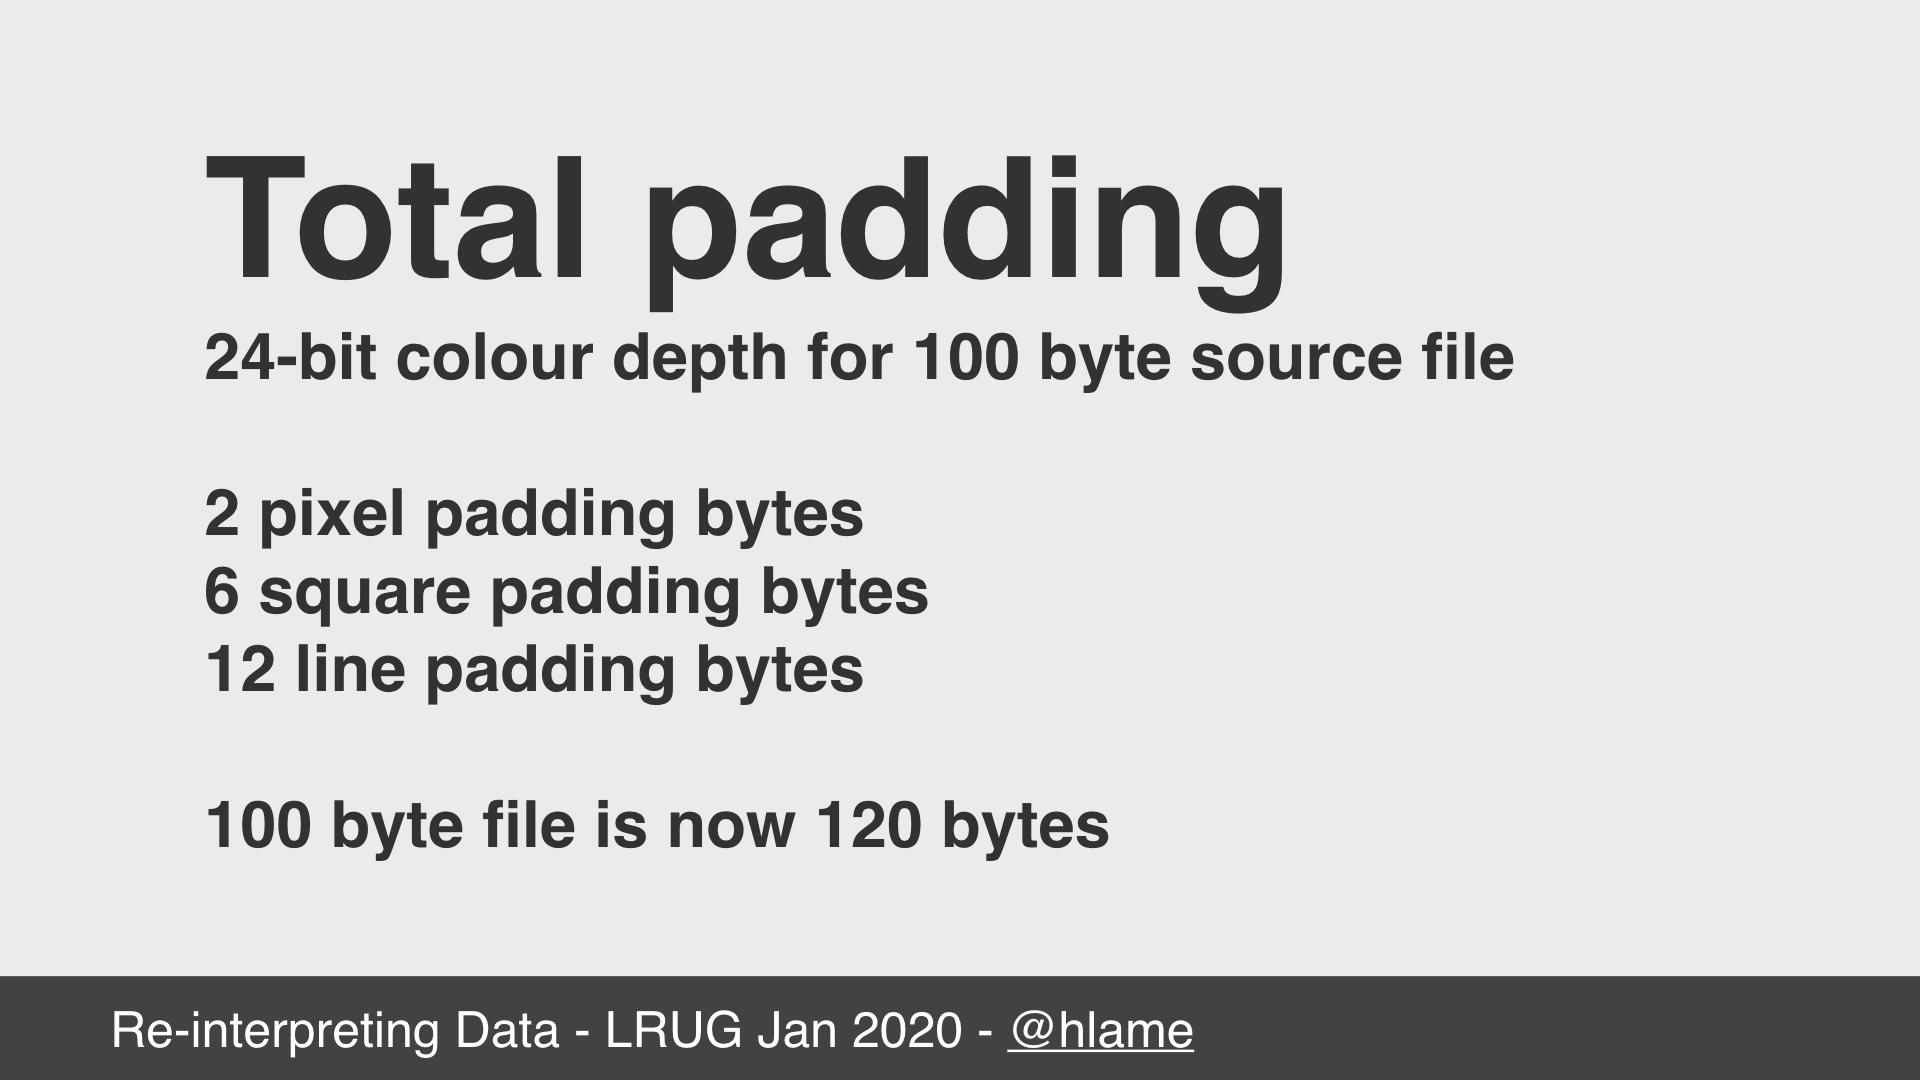 text: Total padding; 24-bit colour depth for 100 byte source file; 2 pixel padding bytes; 6 square pading bytes; 12 line padding bytes; 100 byte file is now 120 bytes